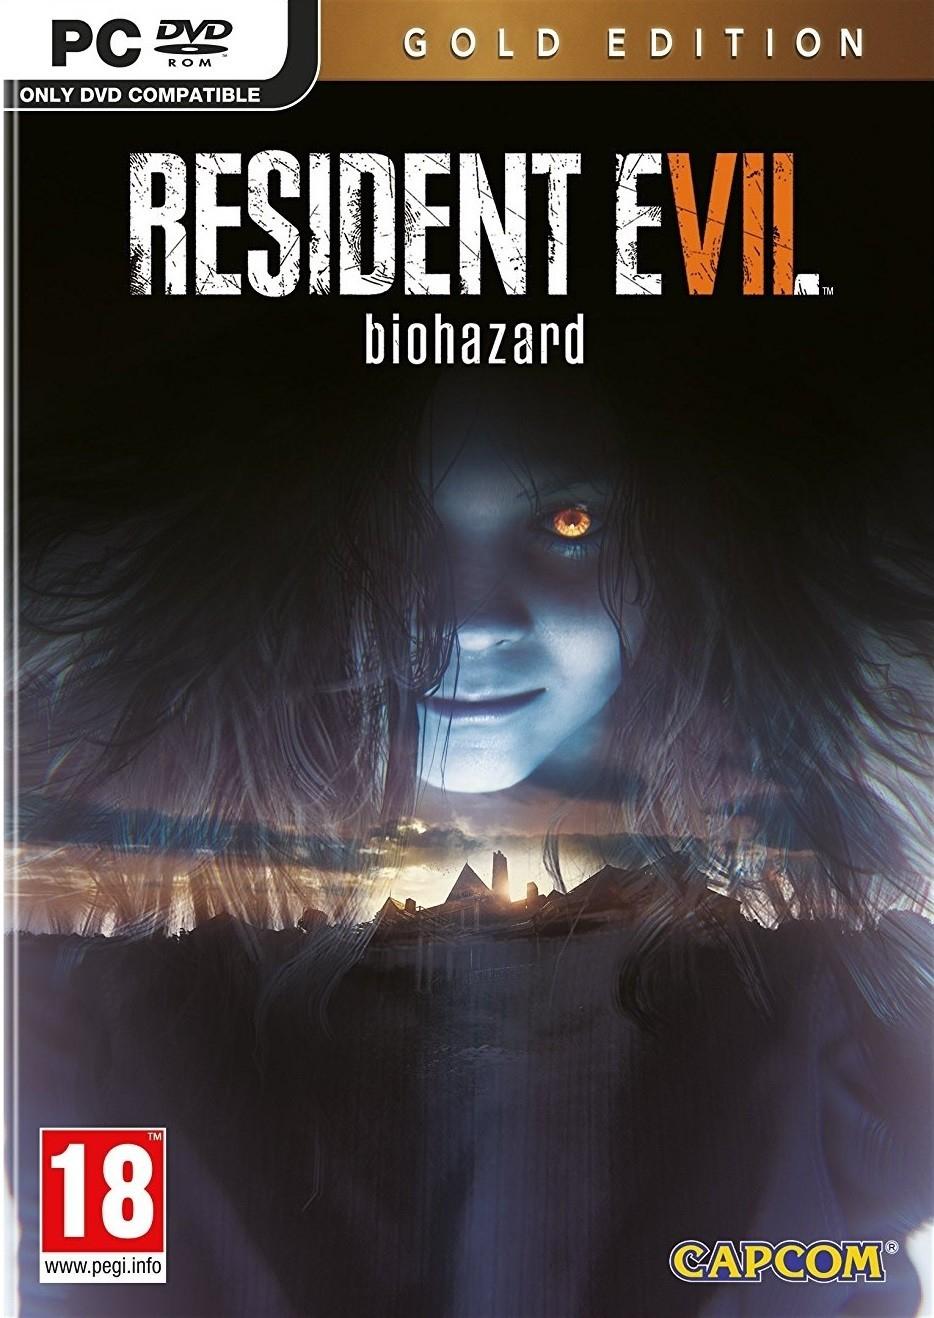 Resident Evil 7 Biohazard (Gold Edition) pc @cdkeys